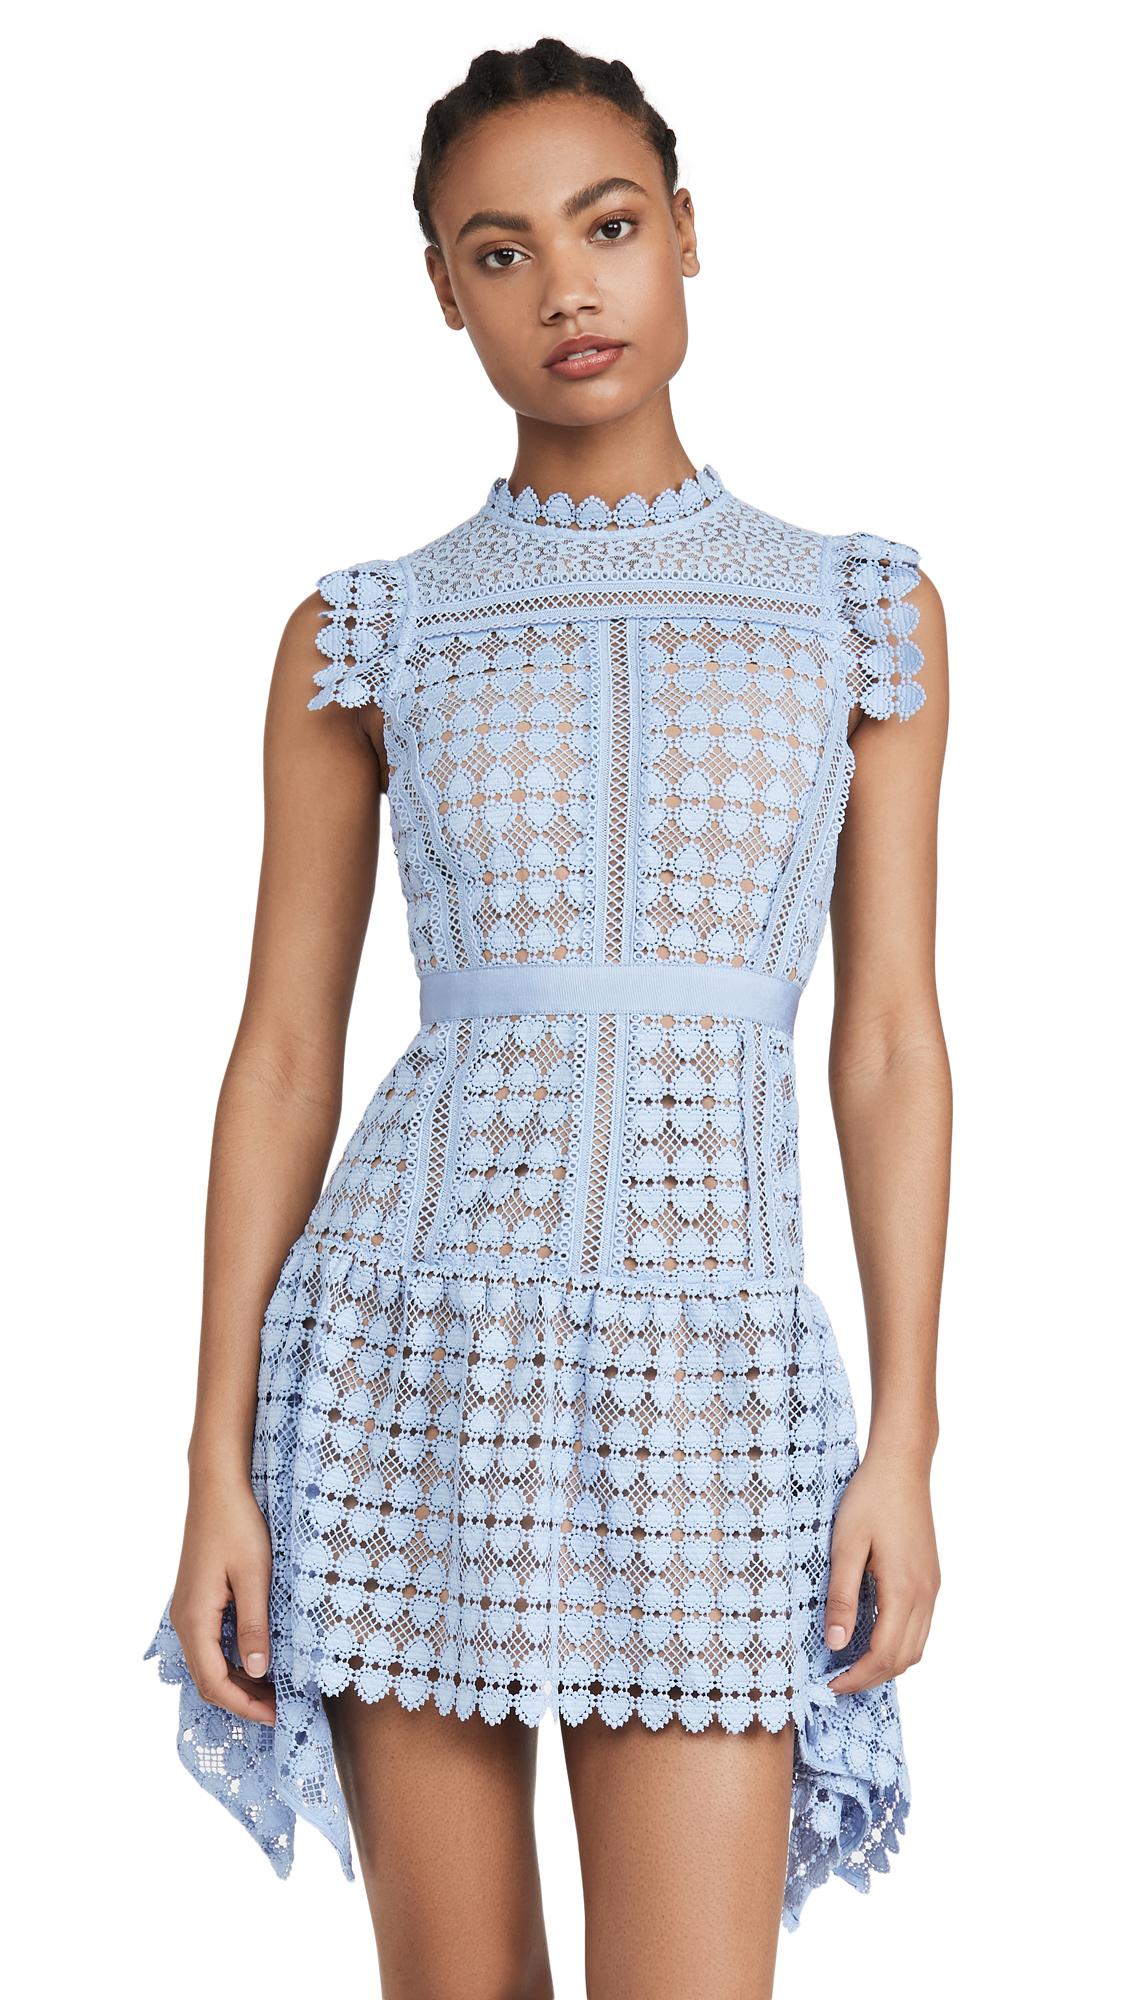 Self Portrait Heart Lace Mini Dress - 50% Off Sale